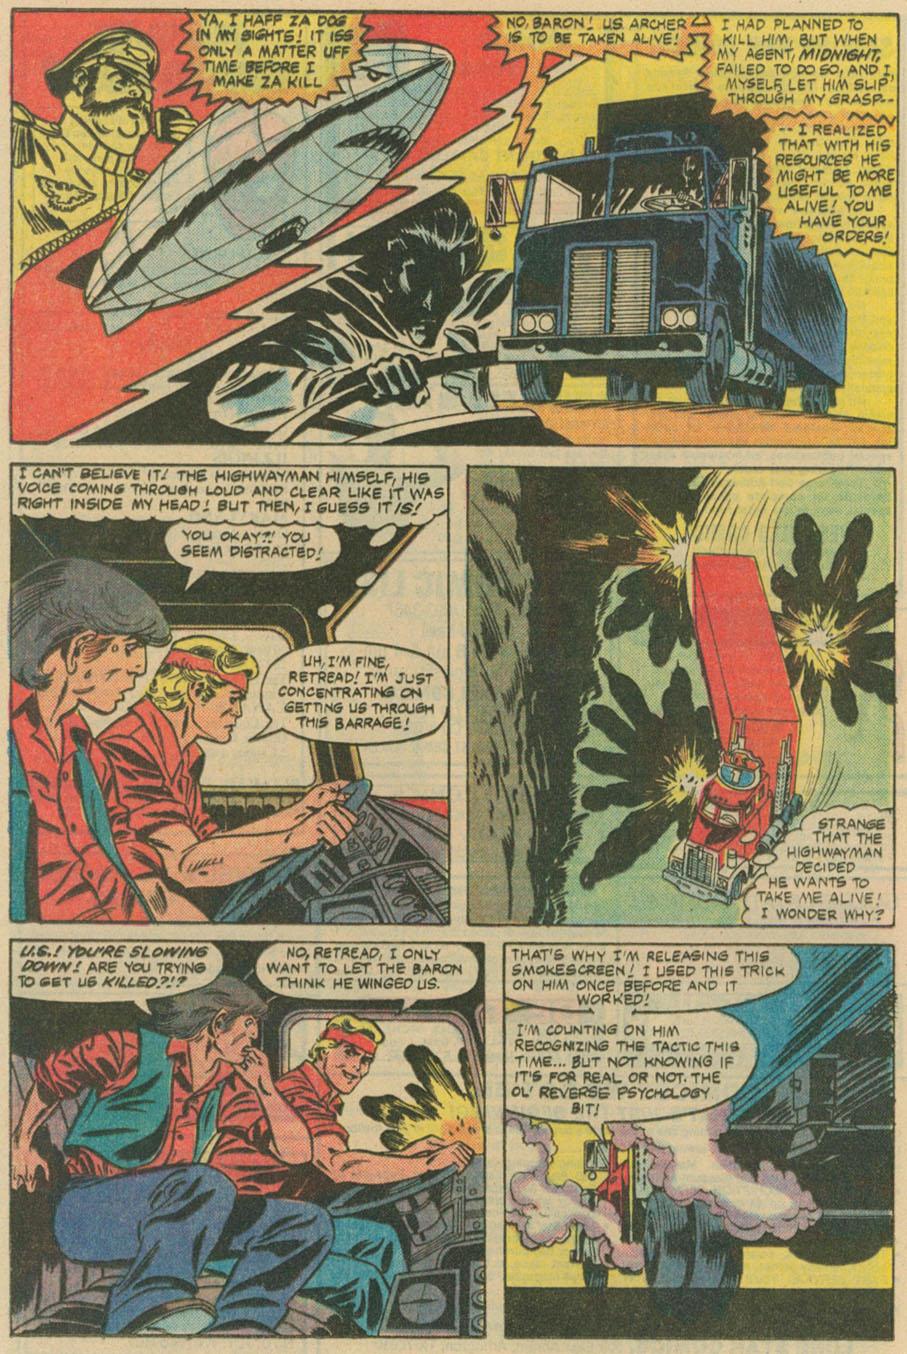 Read online U.S. 1 comic -  Issue #4 - 17